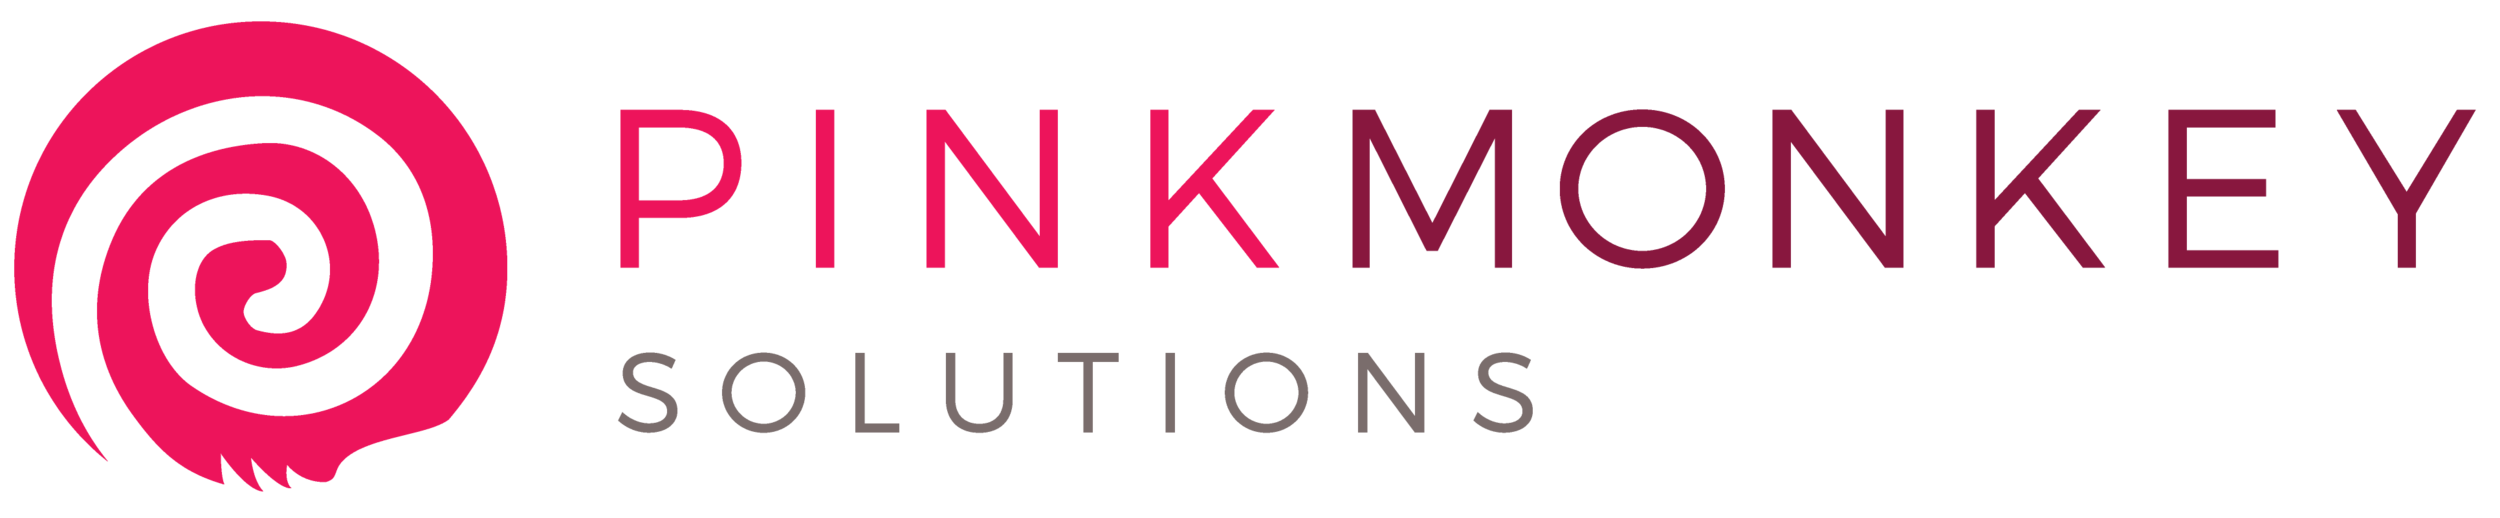 pm-logo-horizontal-3color.png